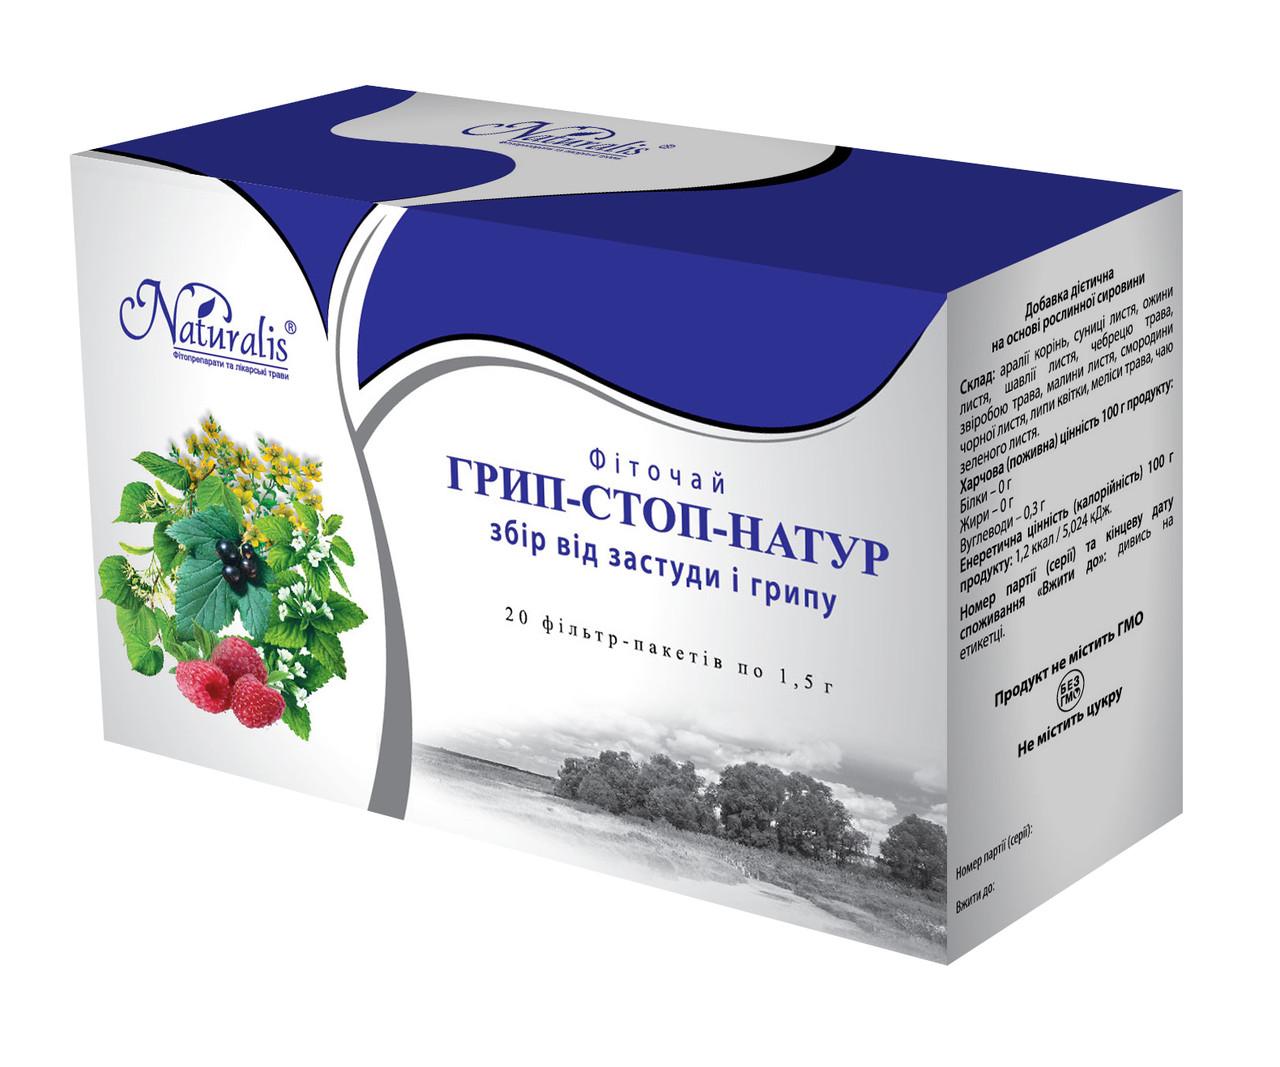 Фитосбор Грип-стоп-Натур (От Простуды) 20пак /Натуралис/